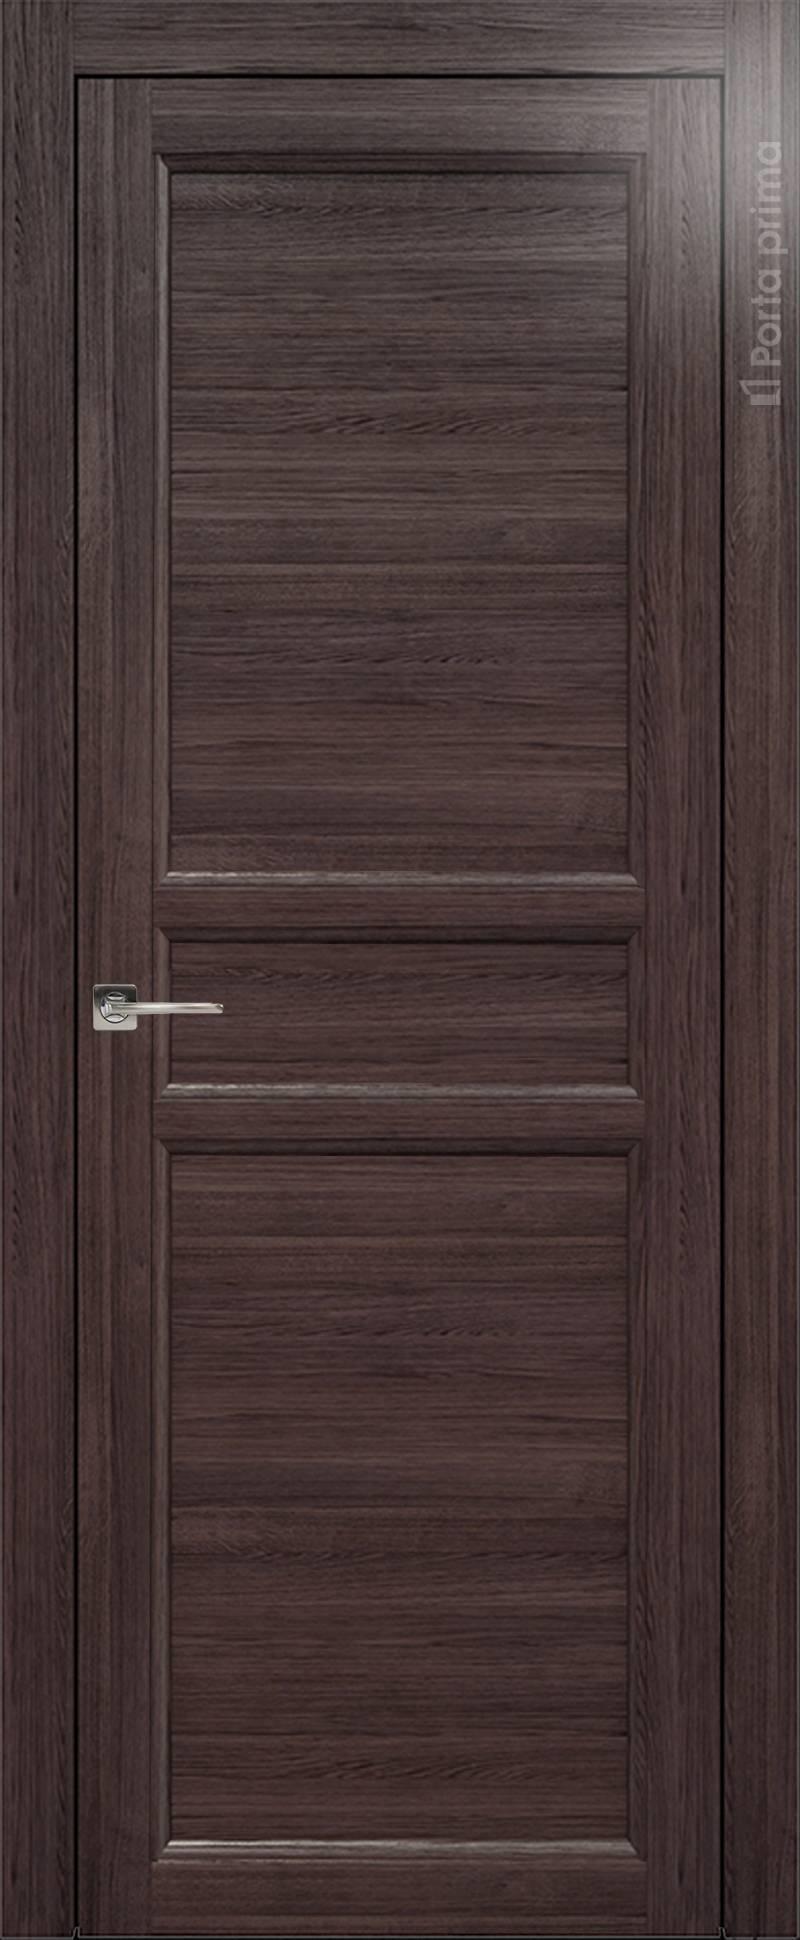 Sorrento-R Г2 цвет - Венге Нуар Без стекла (ДГ)